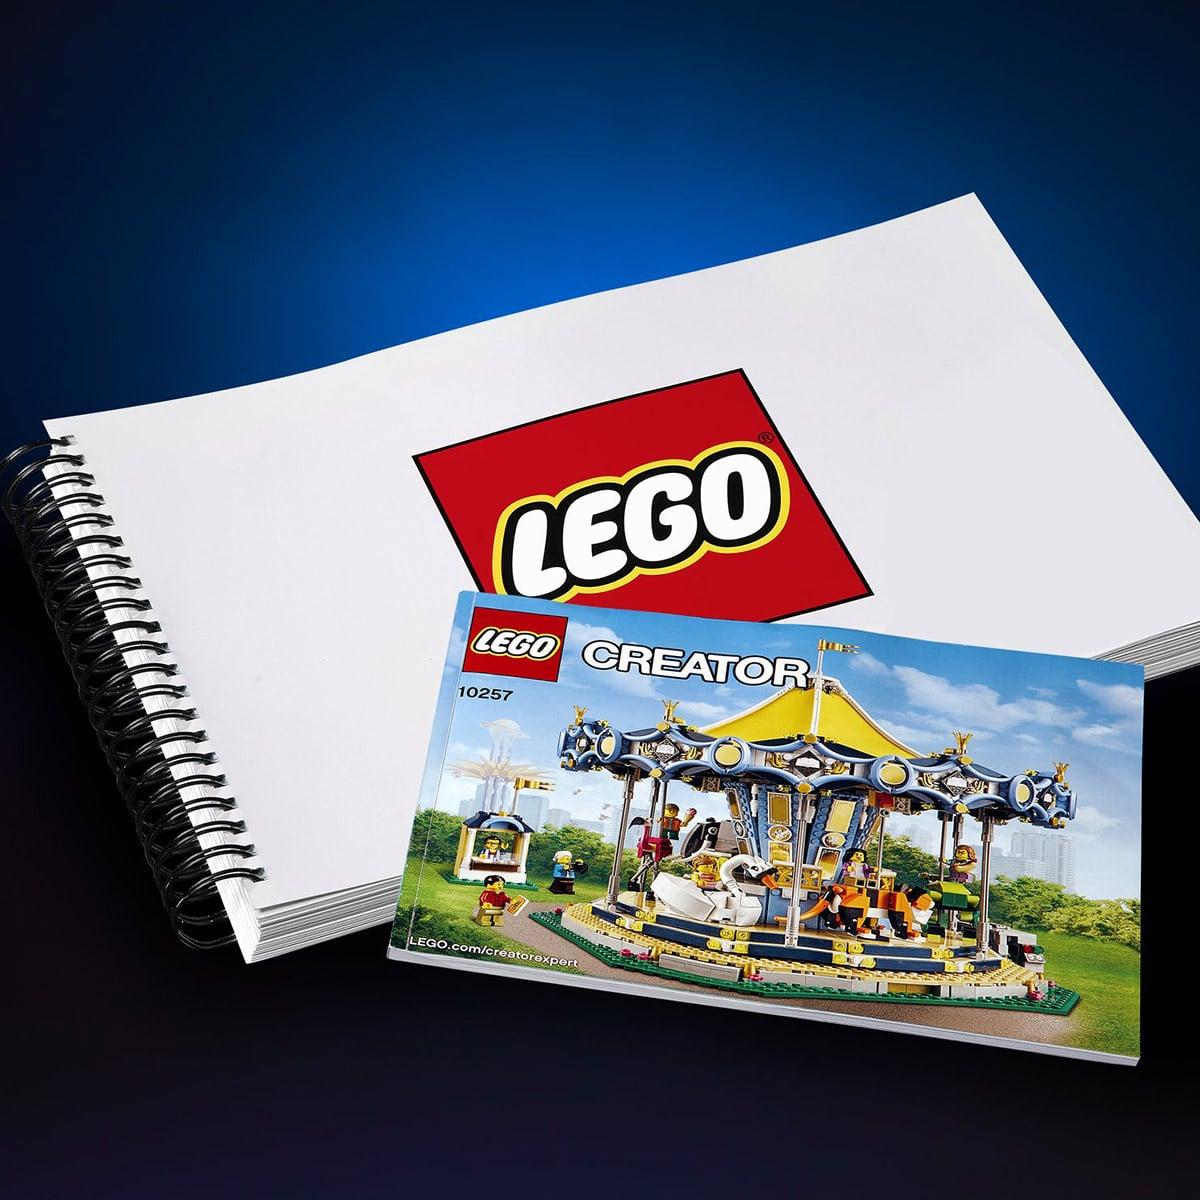 LEGO Star Wars UCS Millenium Falcon Anleitung Teaser